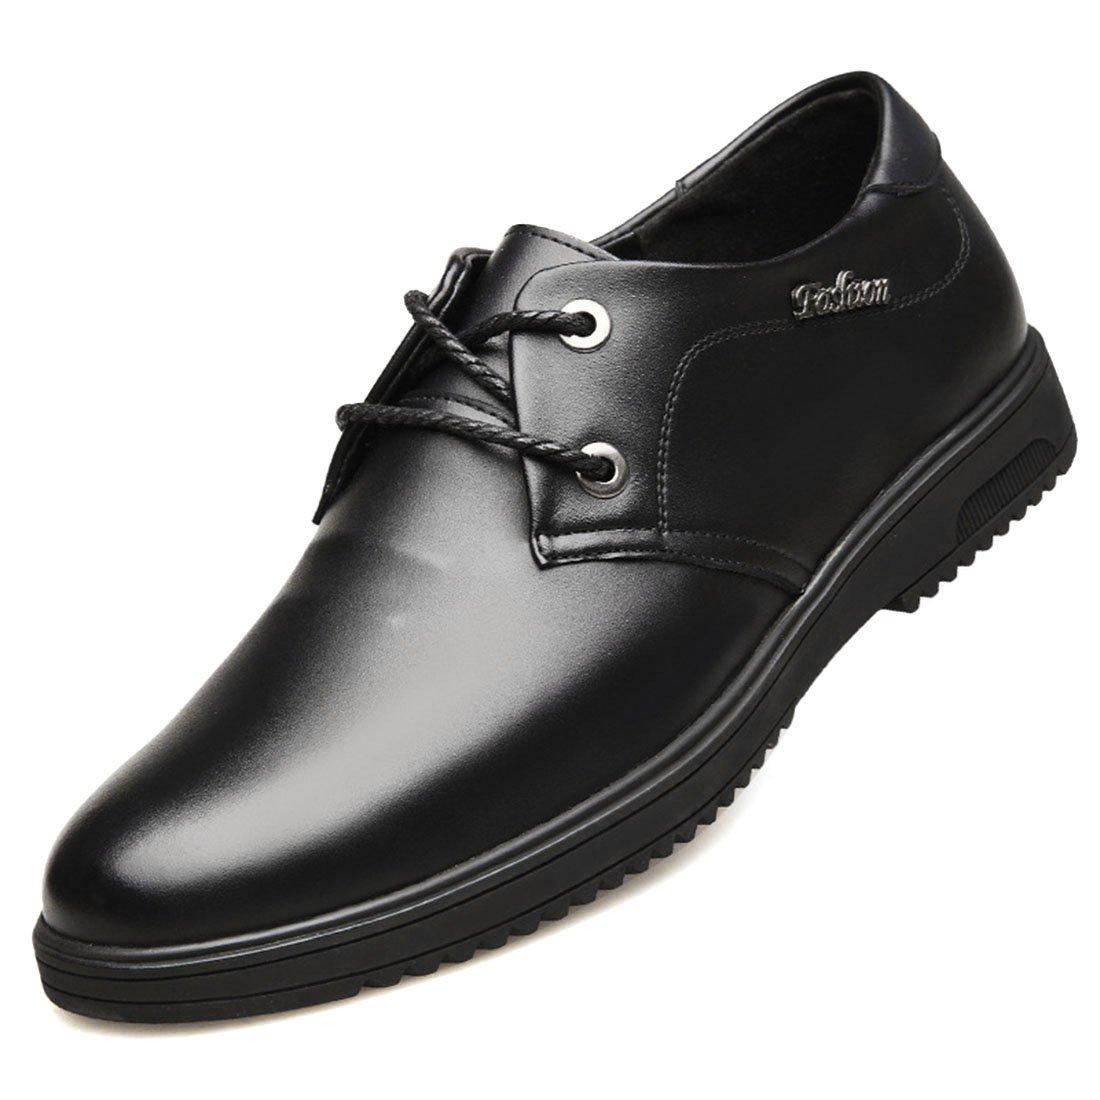 Jiyaru Men's Non-Slip Work Shoes Restaurant Kitchen Waterproof Chef Business Flats Black Asian 42 / US 8.5